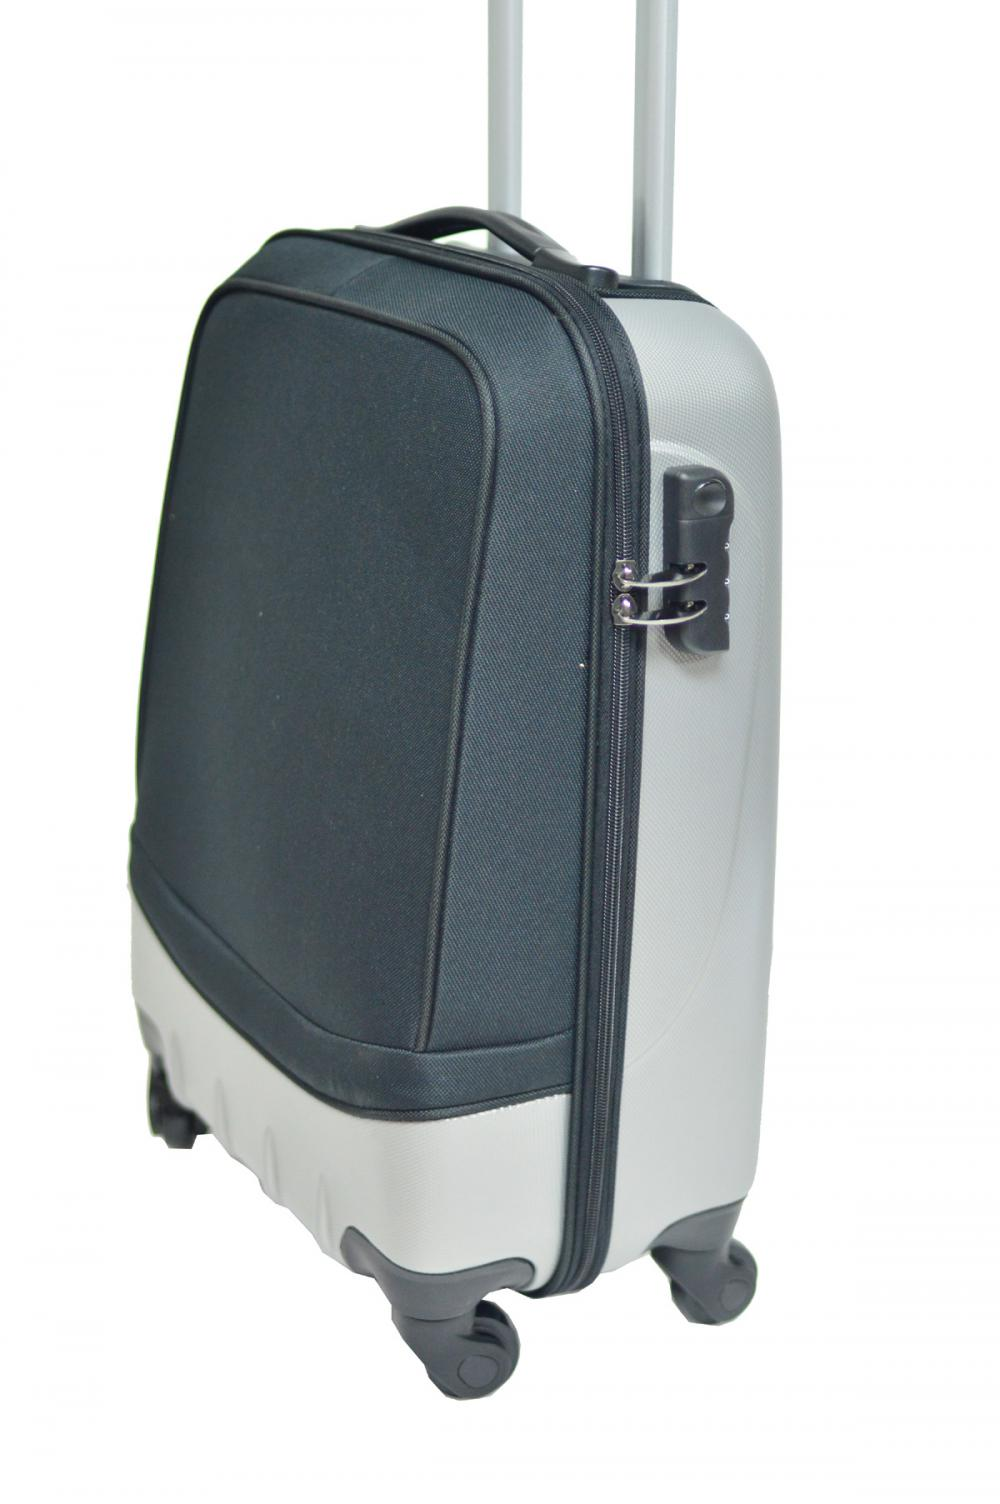 EVA Trolley Case